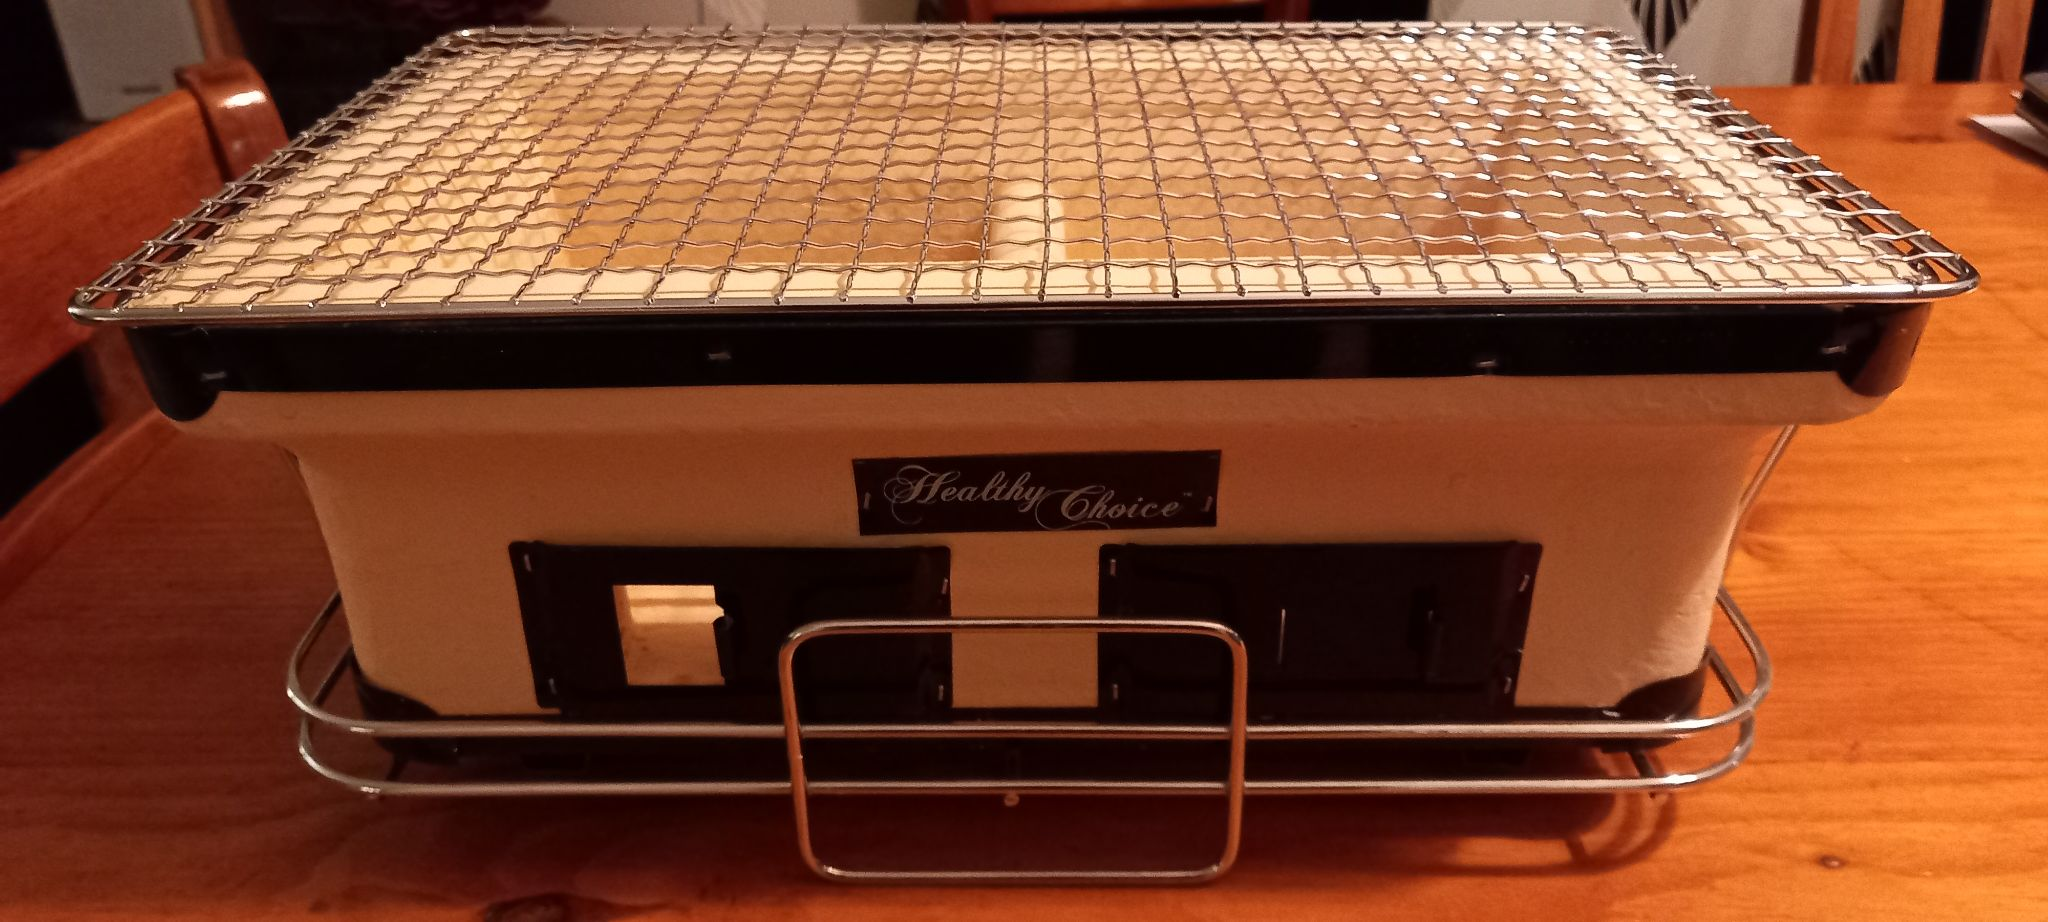 A modern hibachi grill